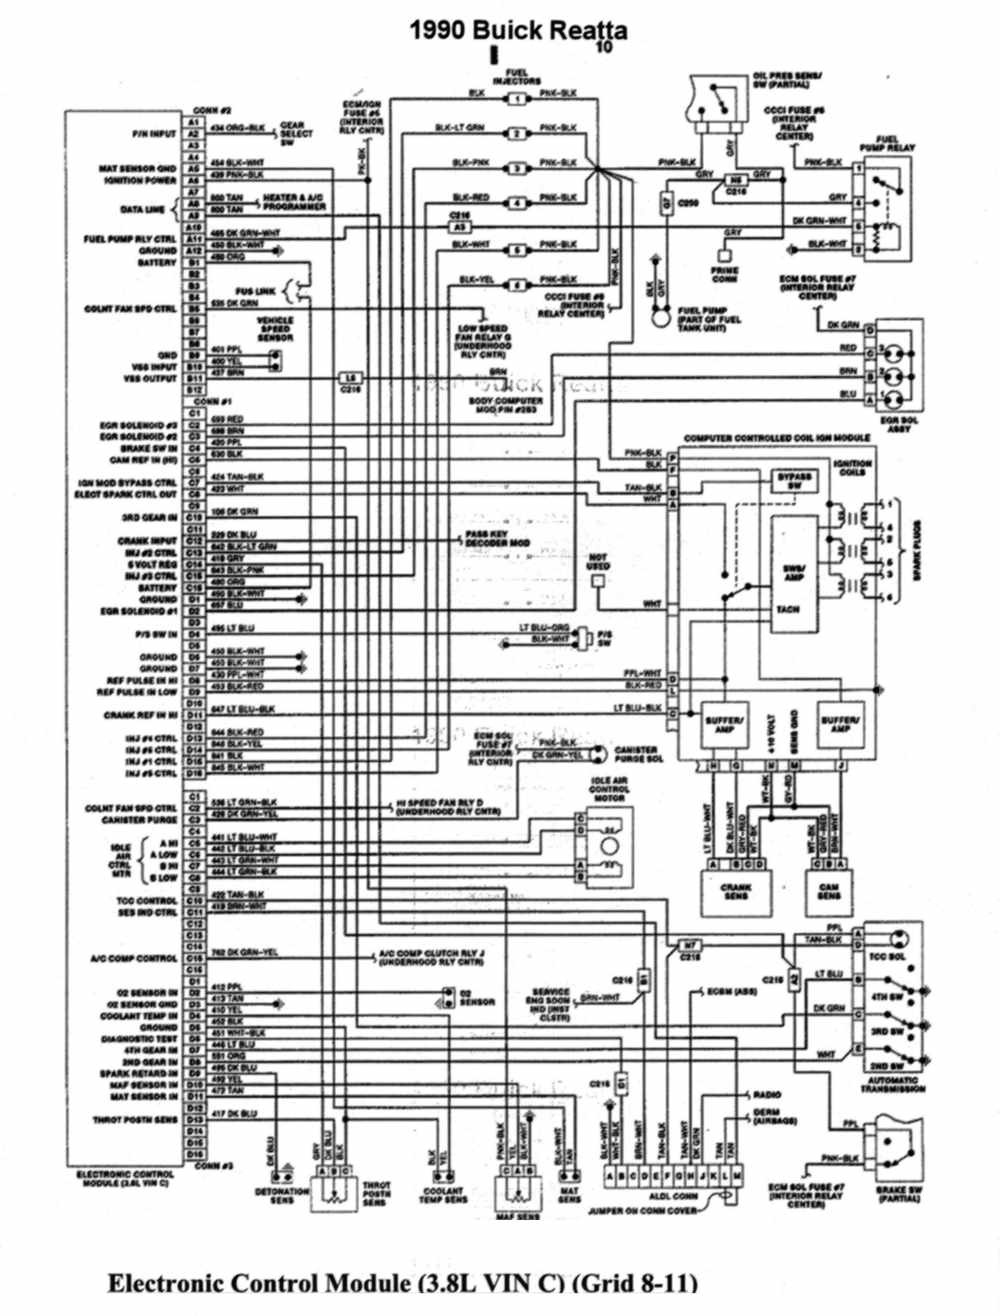 1990 buick reatta fuse box diagram enthusiast wiring diagrams u2022 rh rasalibre co Buick LeSabre Car Problems Buick LeSabre Troubleshooting